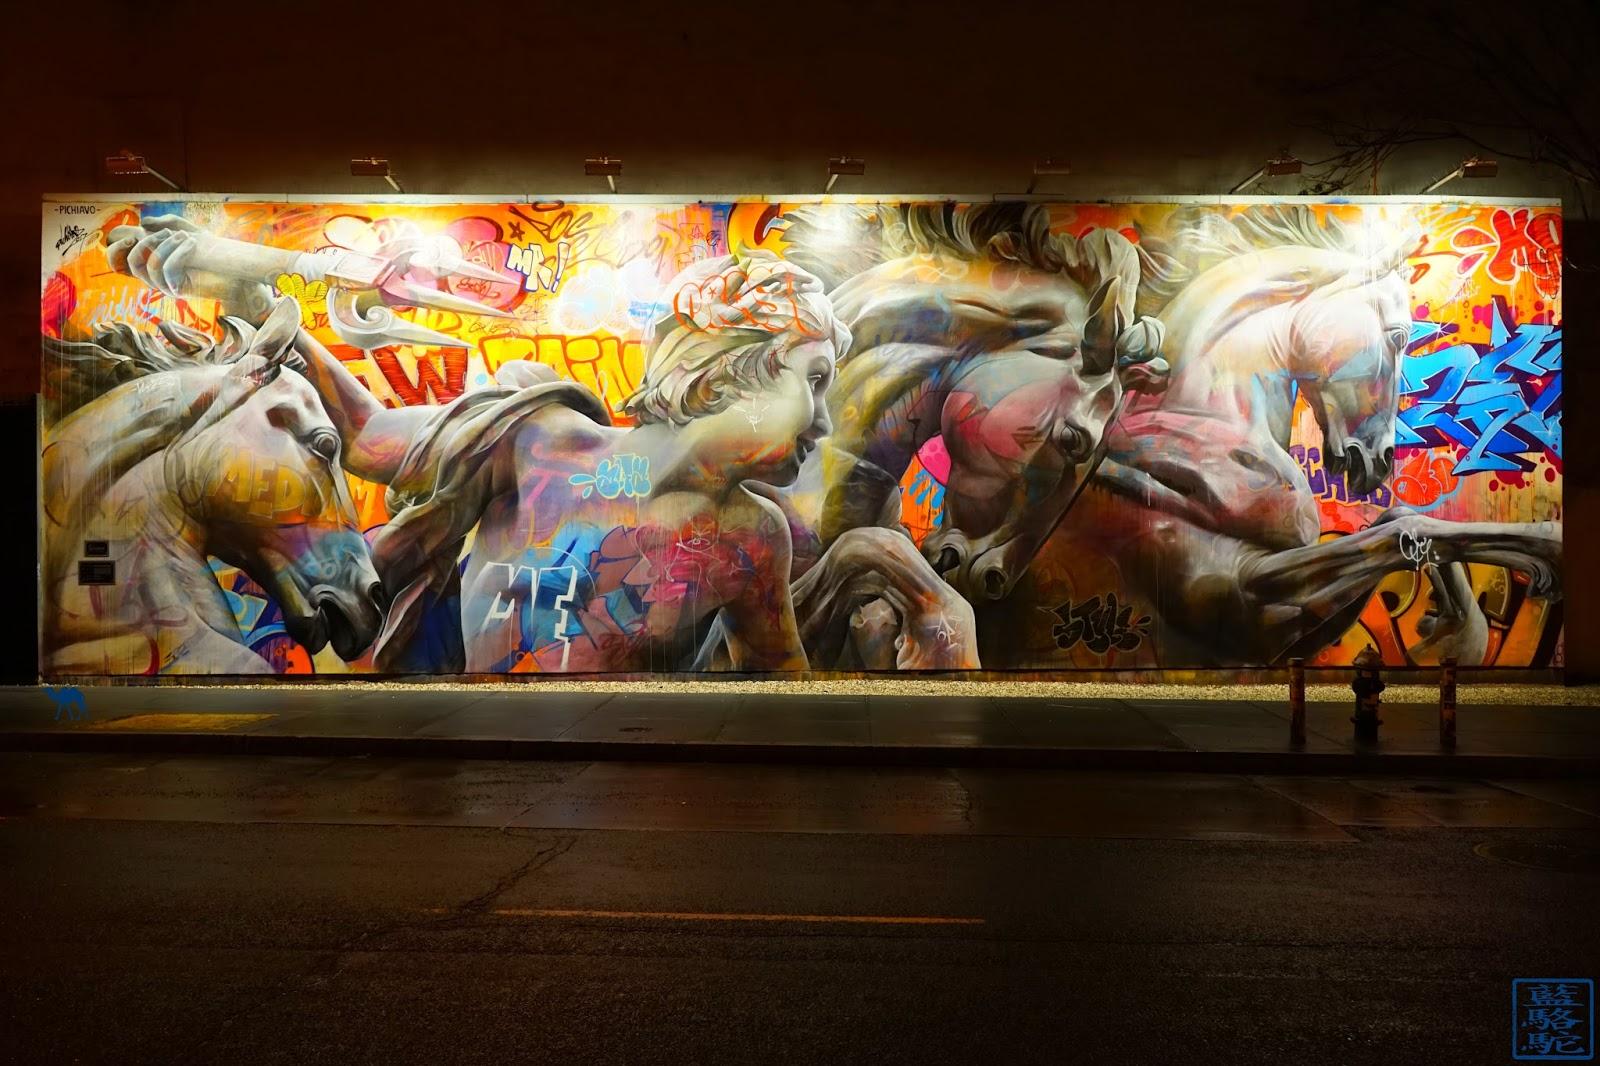 Le Chameau Bleu - Street Art New York USA - Voyage à new York